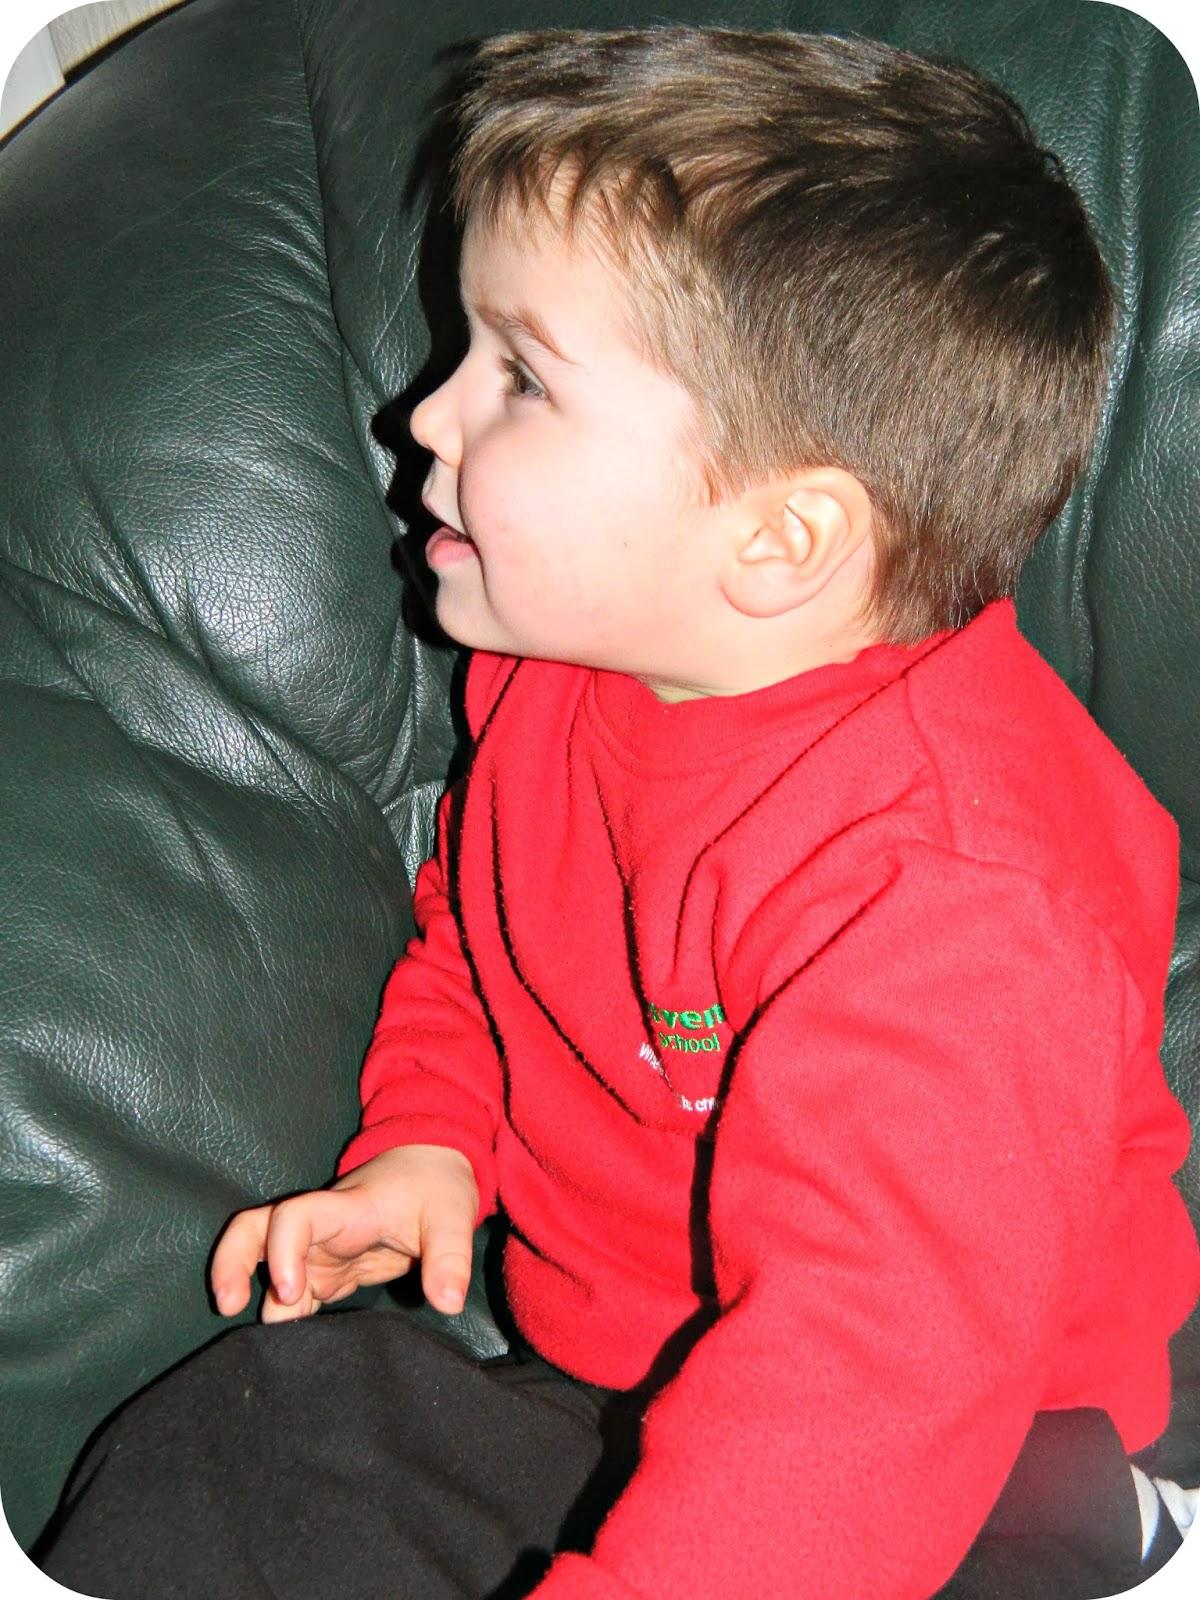 Engrossed in Bedknobs and Broomsticks